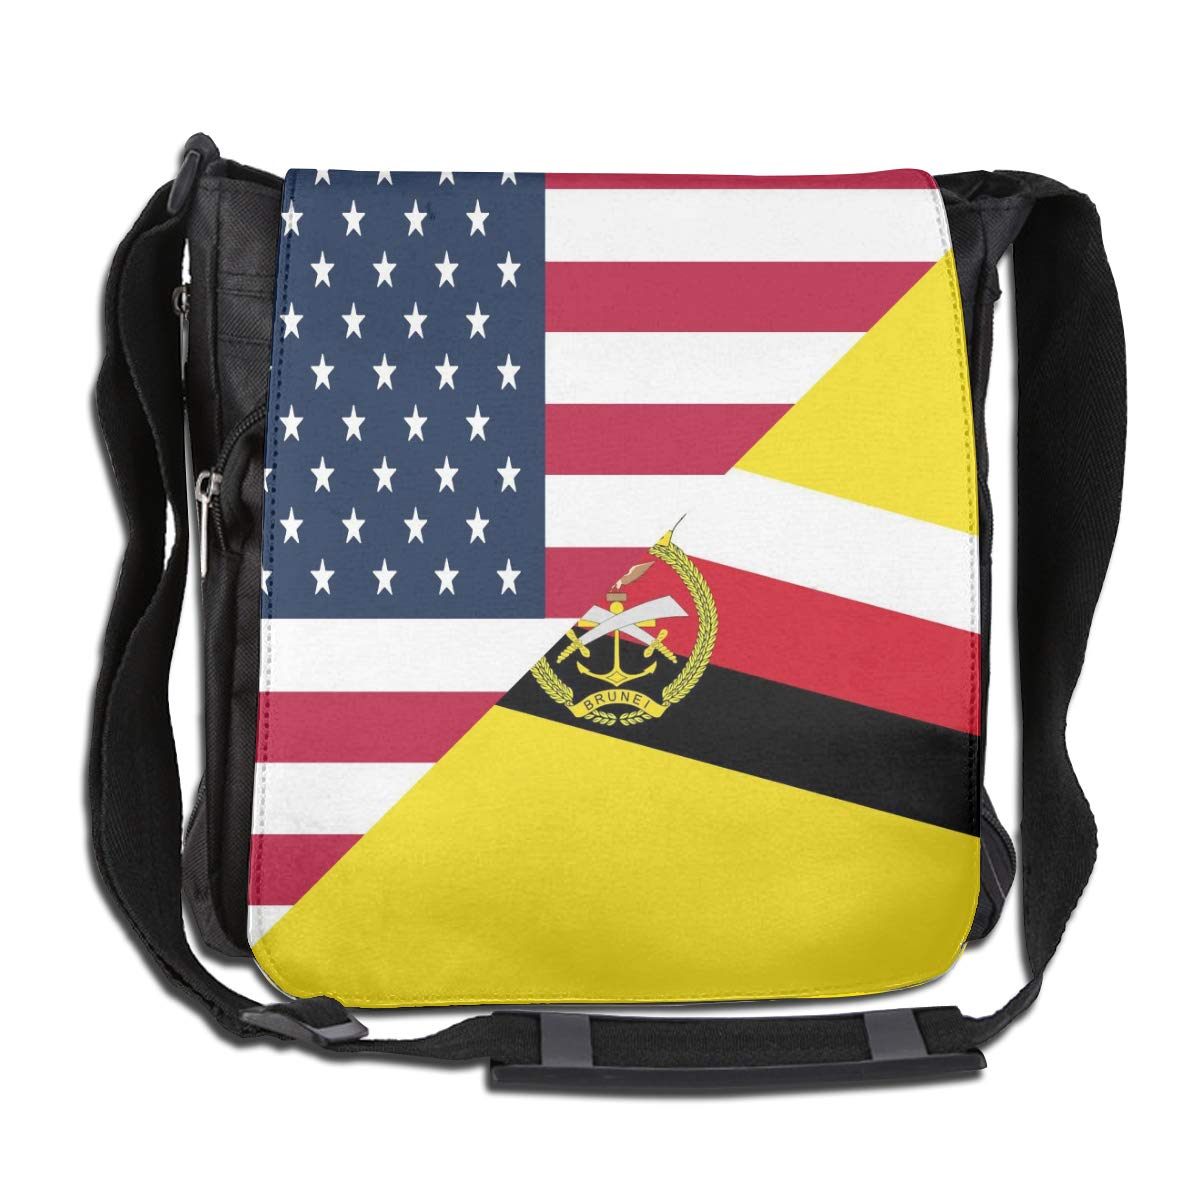 American And Brunei Flag Crossbody Shoulder Bag Fashion Casual Daily Messenger Bag Satchel School Bag For Women And Men